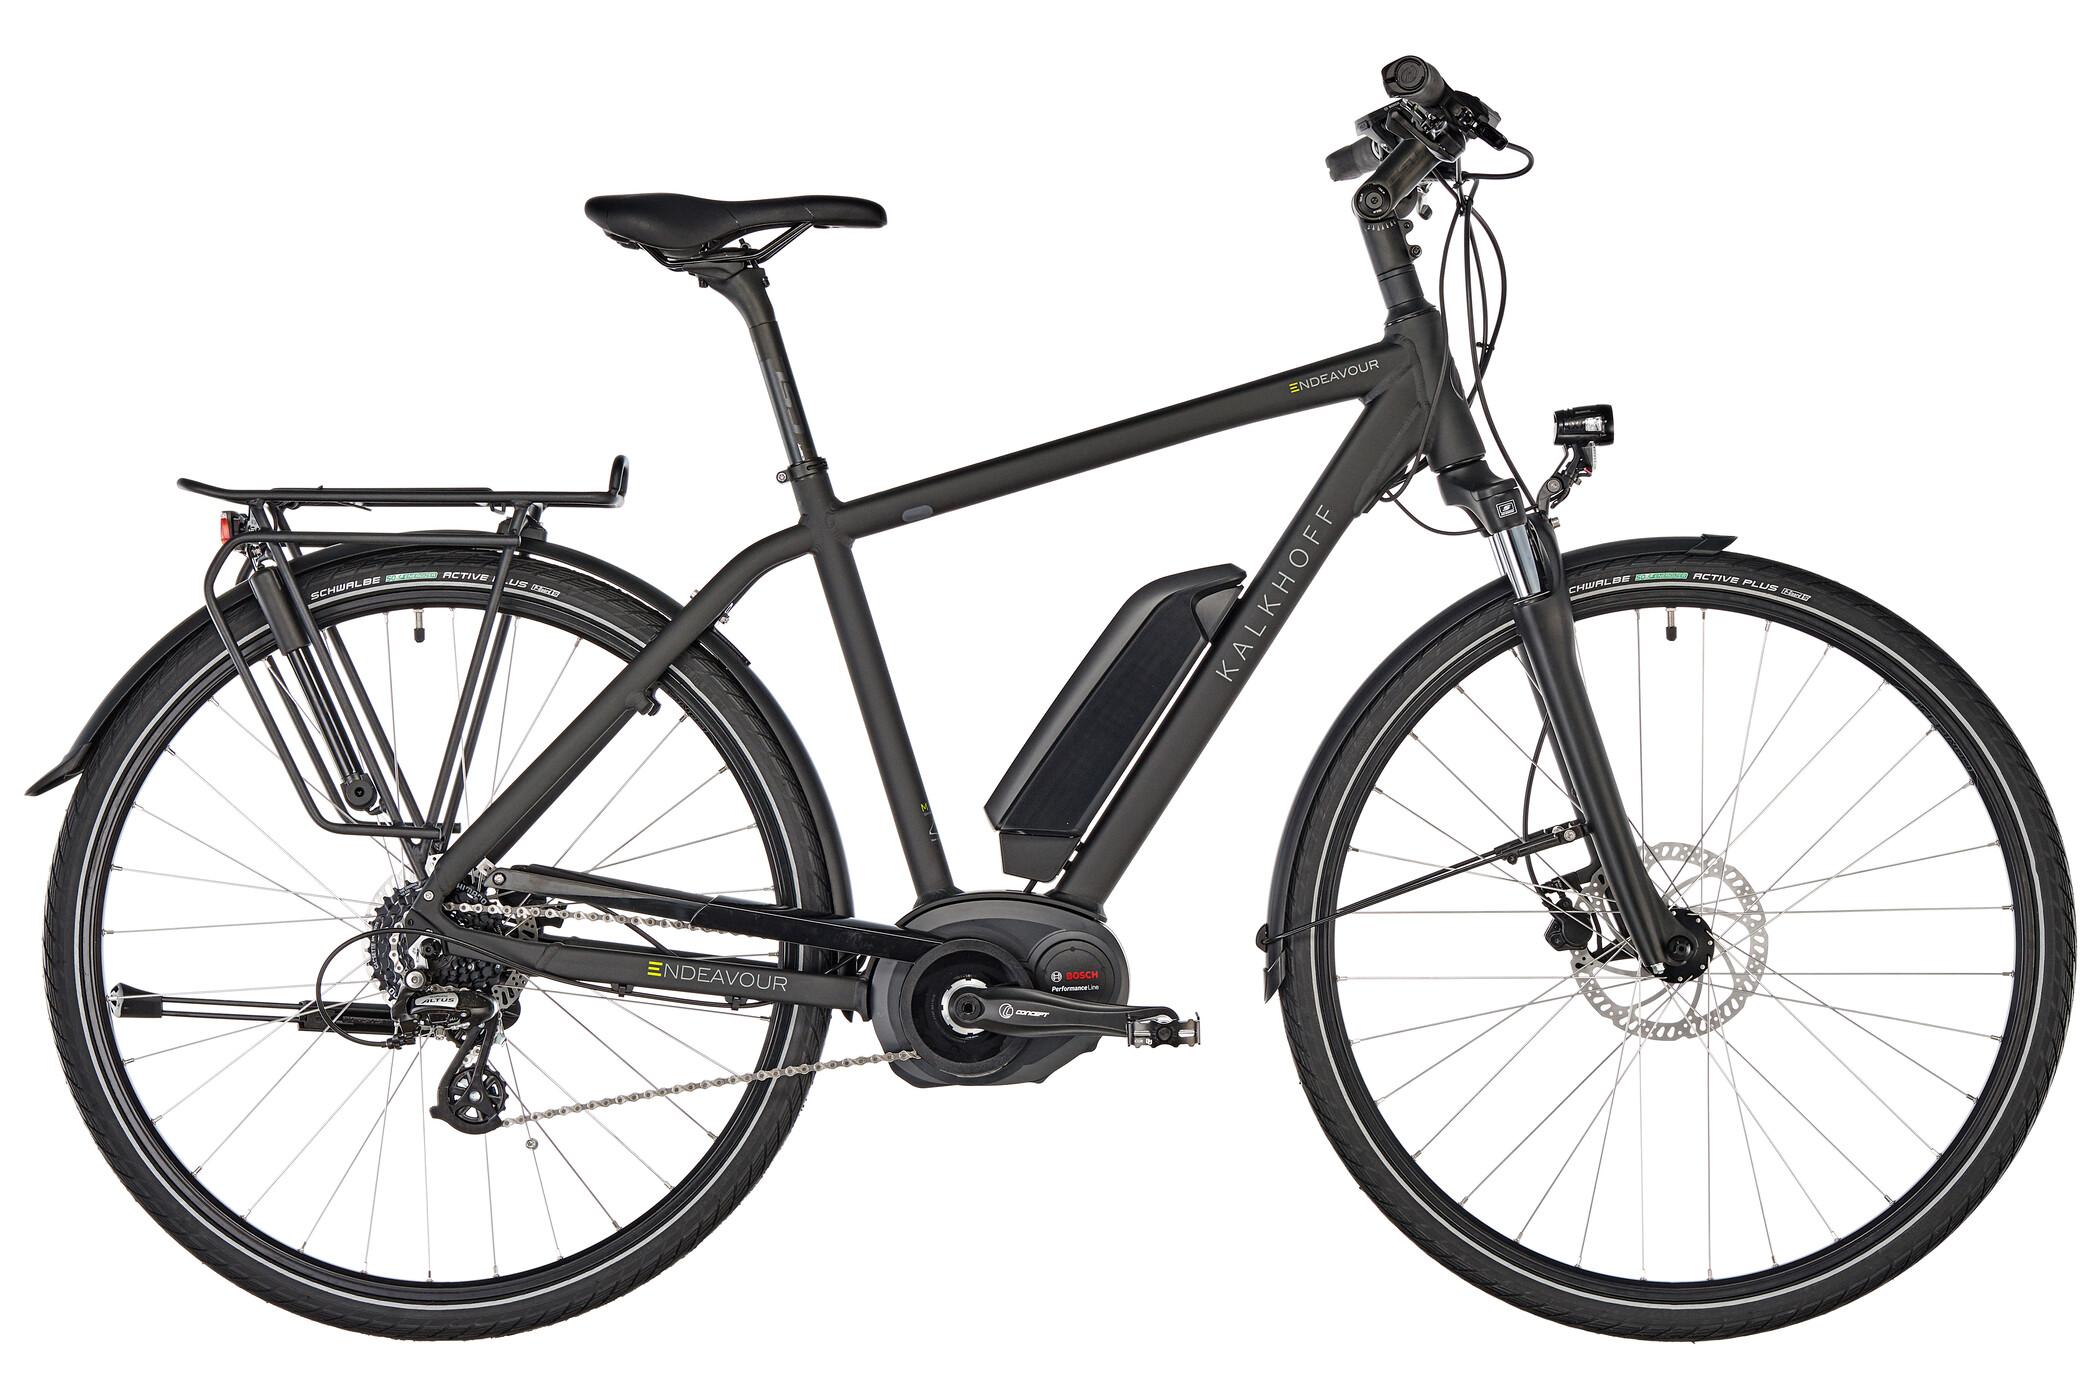 Kalkhoff Endeavour 1.B Move E-trekkingcykel Diamant 500Wh sort (2019) | City-cykler